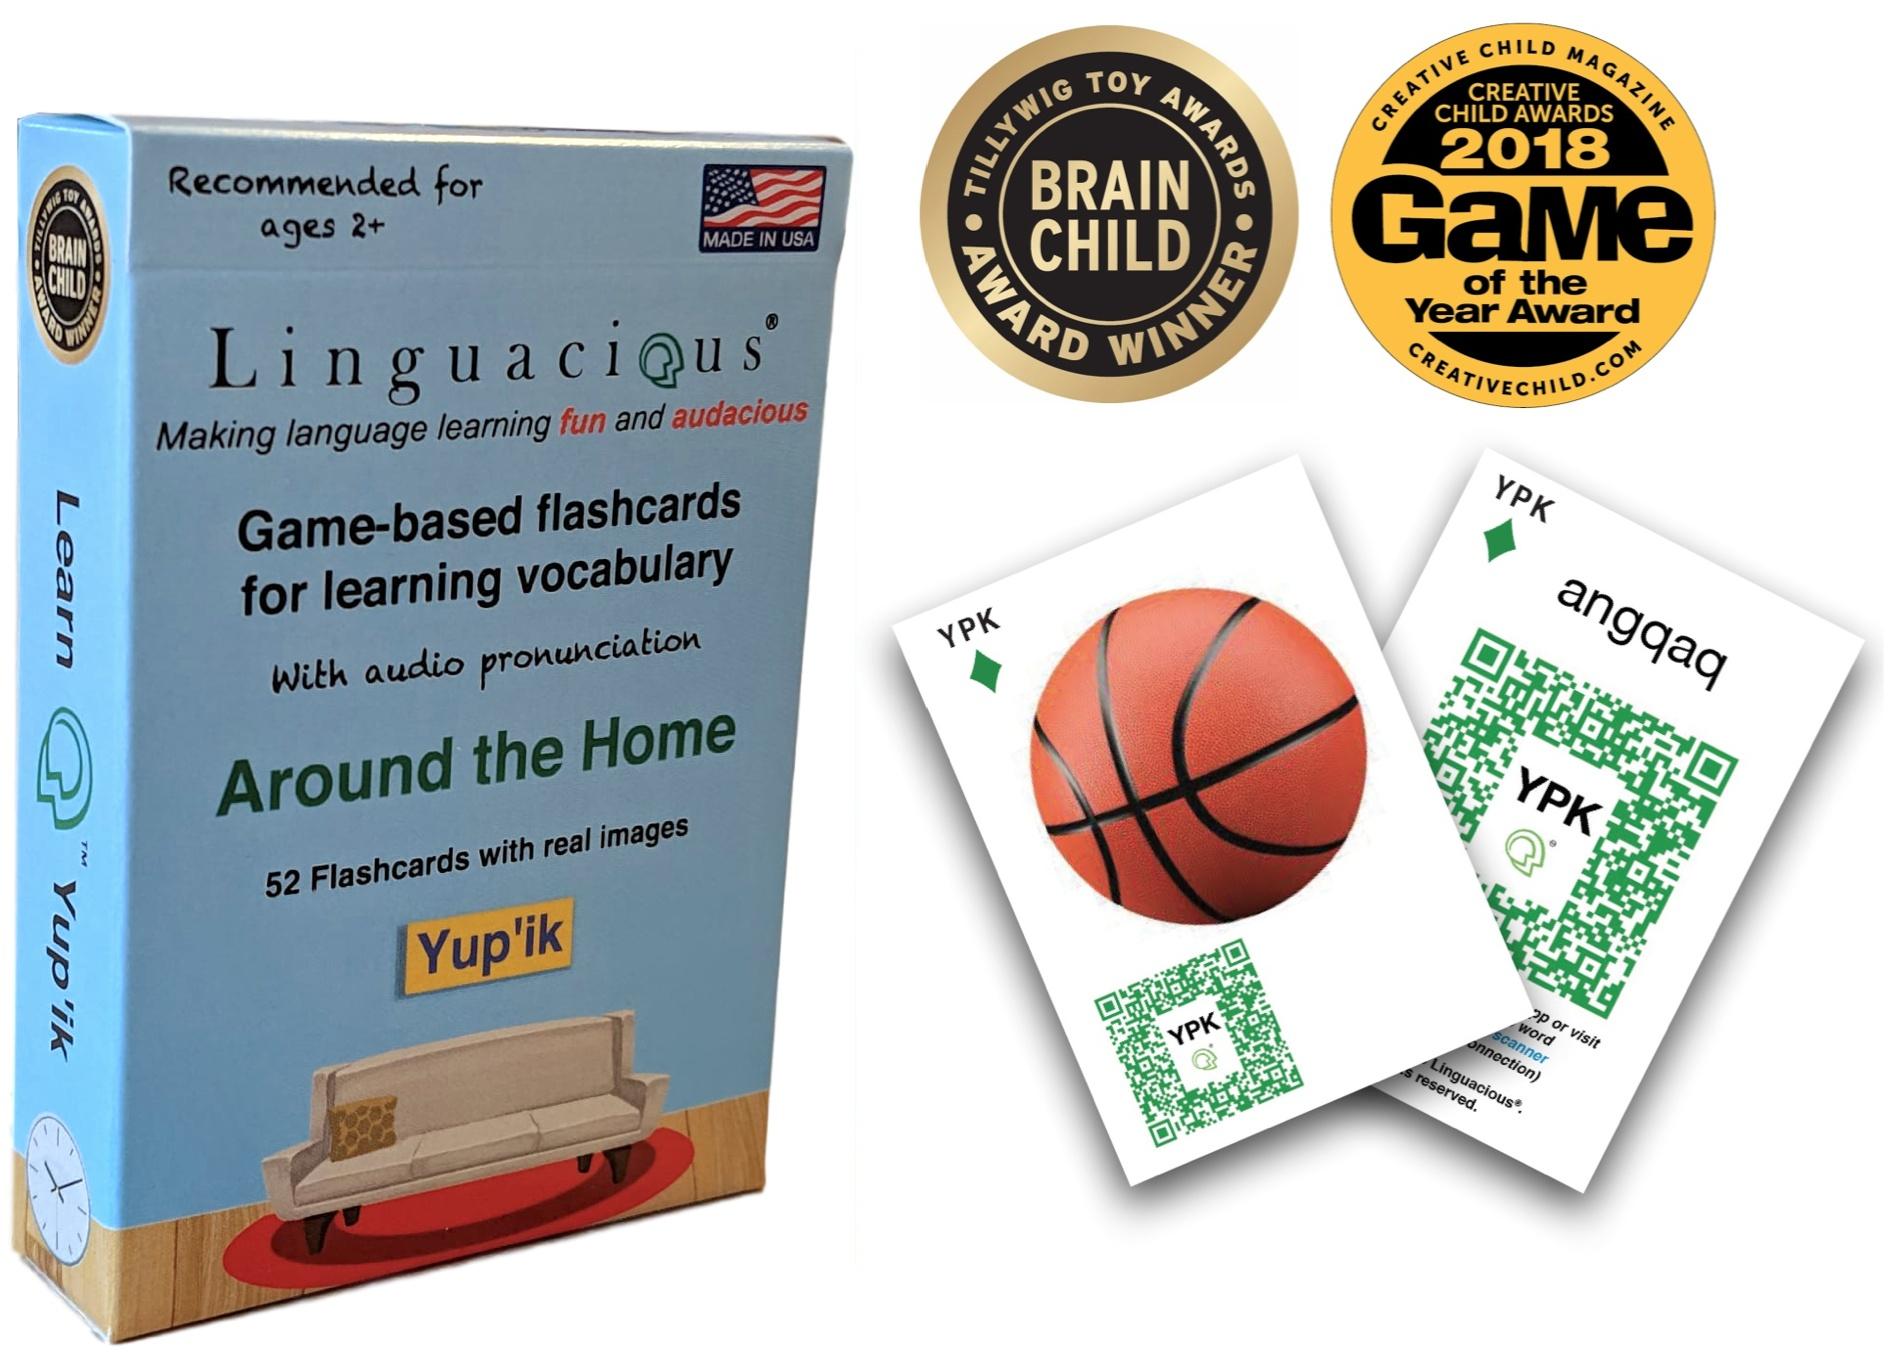 Around the Home Flashcards - Yup'ik (52 cards) — Linguacious®